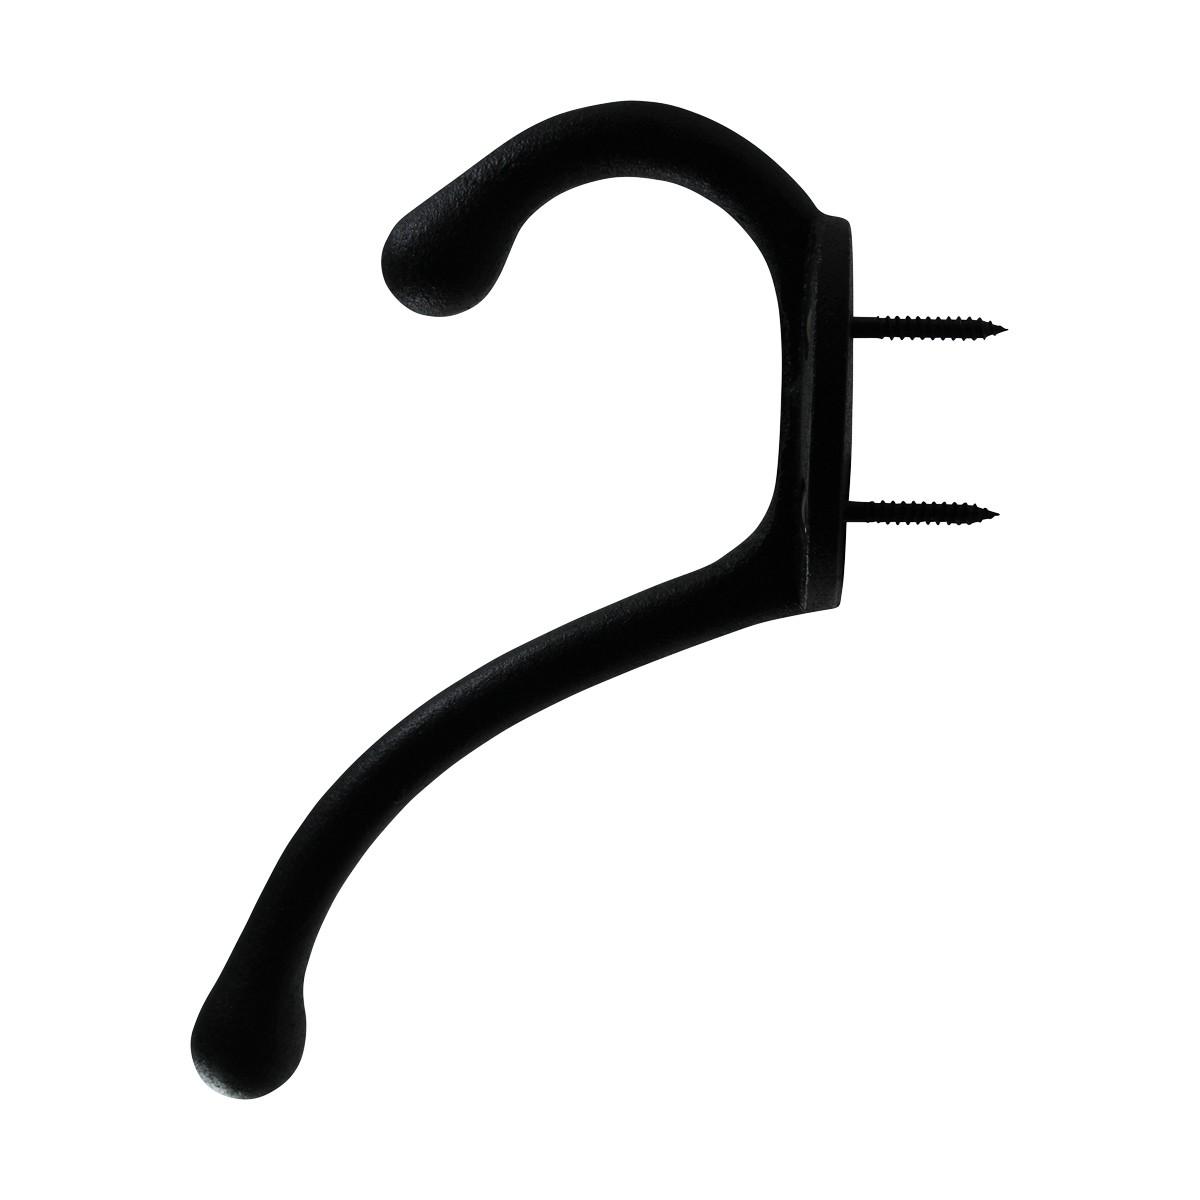 25 Hook Wrought Iron Black Cast RSF 5 12H X 3 34 Proj Hooks Decorative Hook Coat Hook